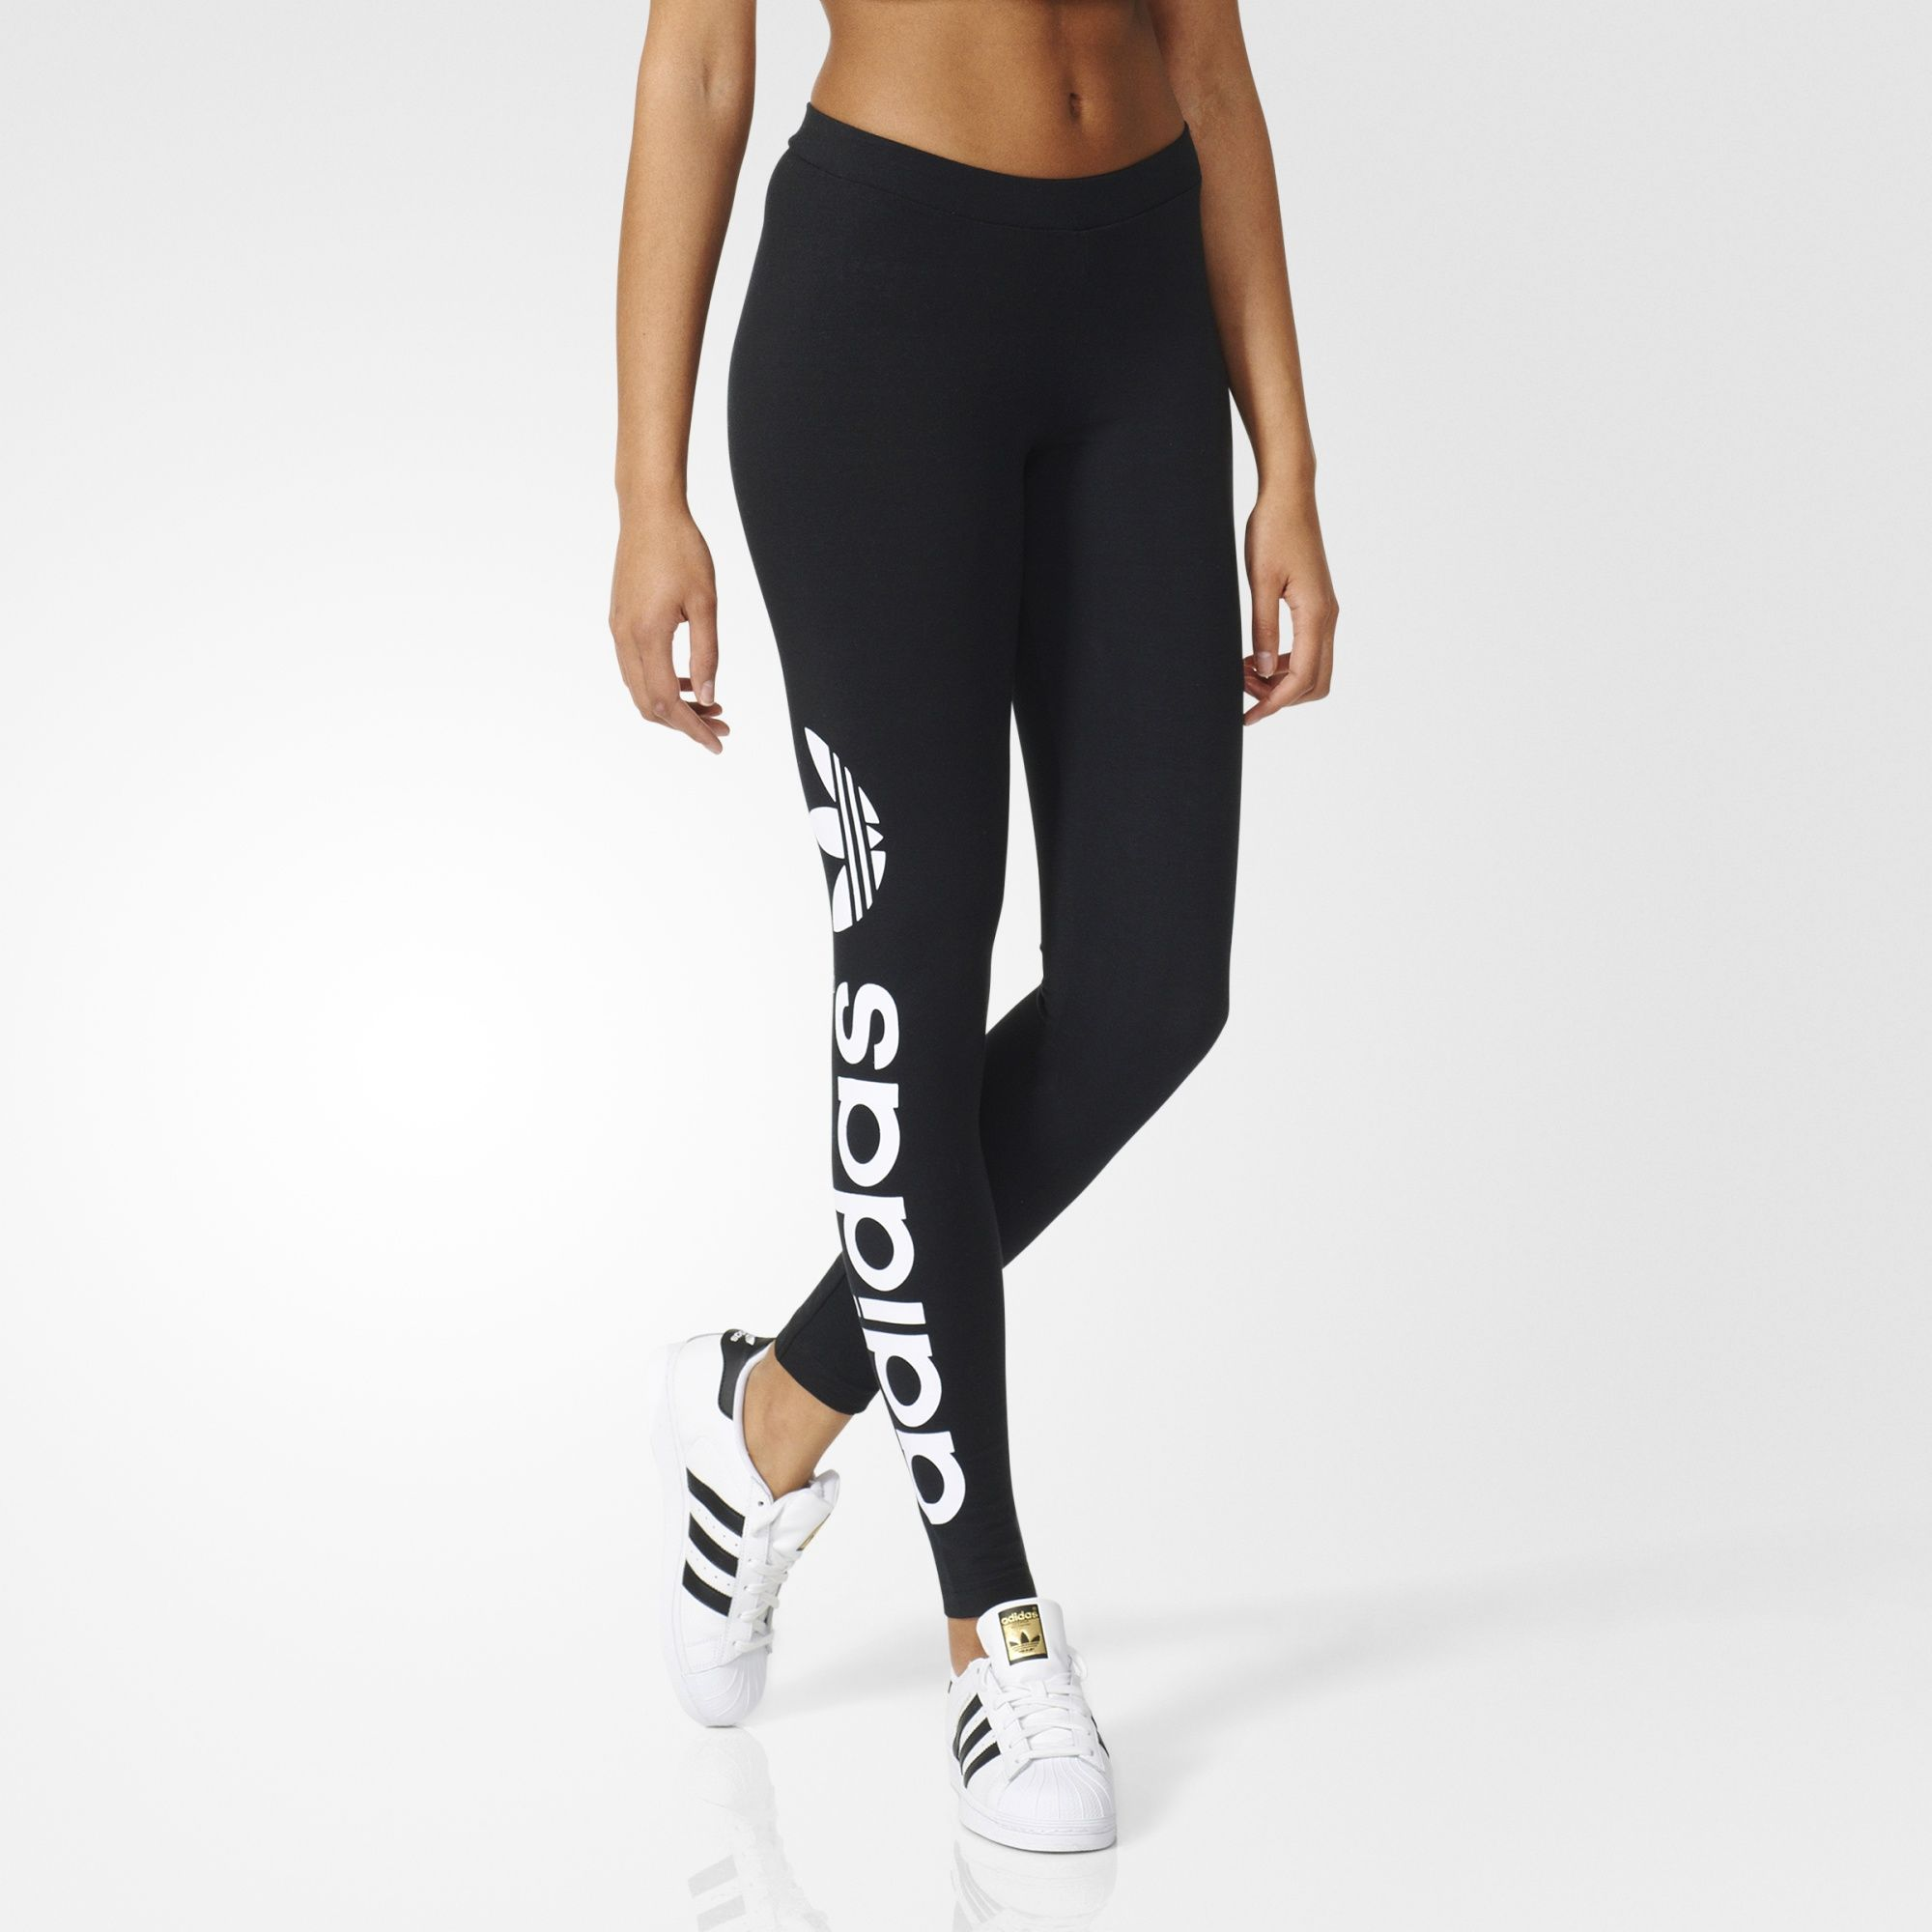 adidas legging linear wishlist pinterest tenues de sport de sport et sports. Black Bedroom Furniture Sets. Home Design Ideas